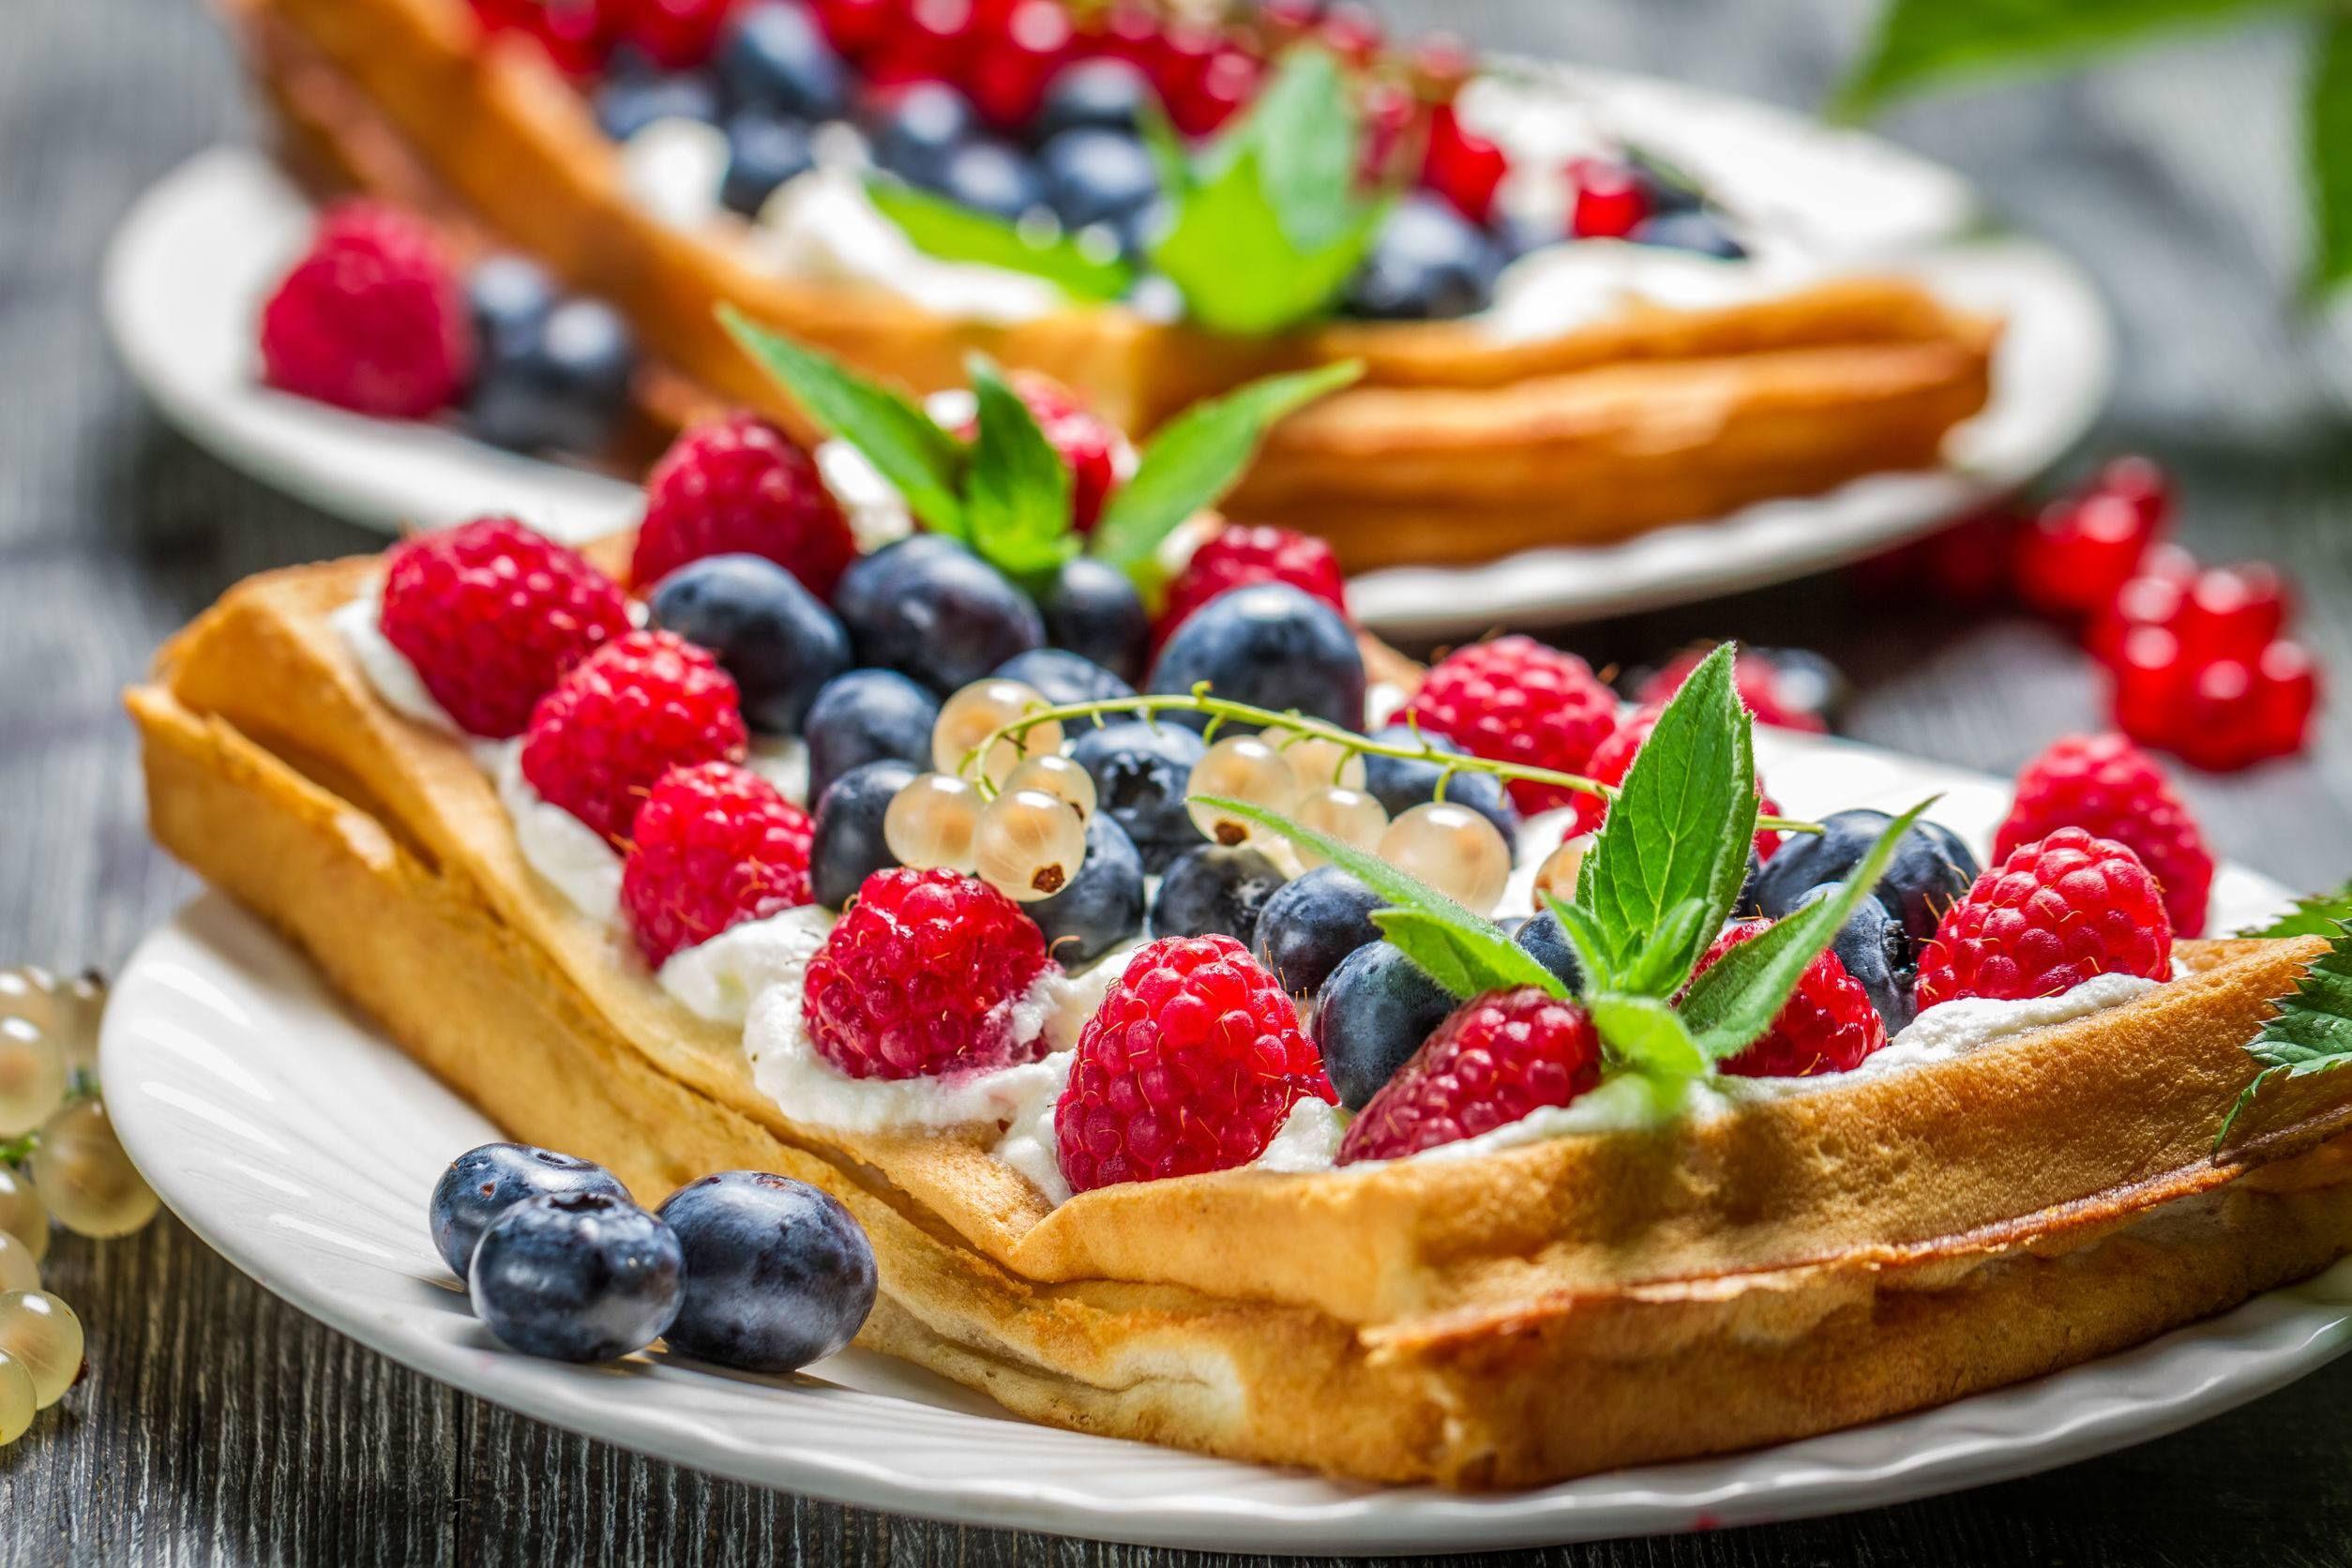 Strona główna Blox.pl Dessert waffles, Food, Yummy waffles